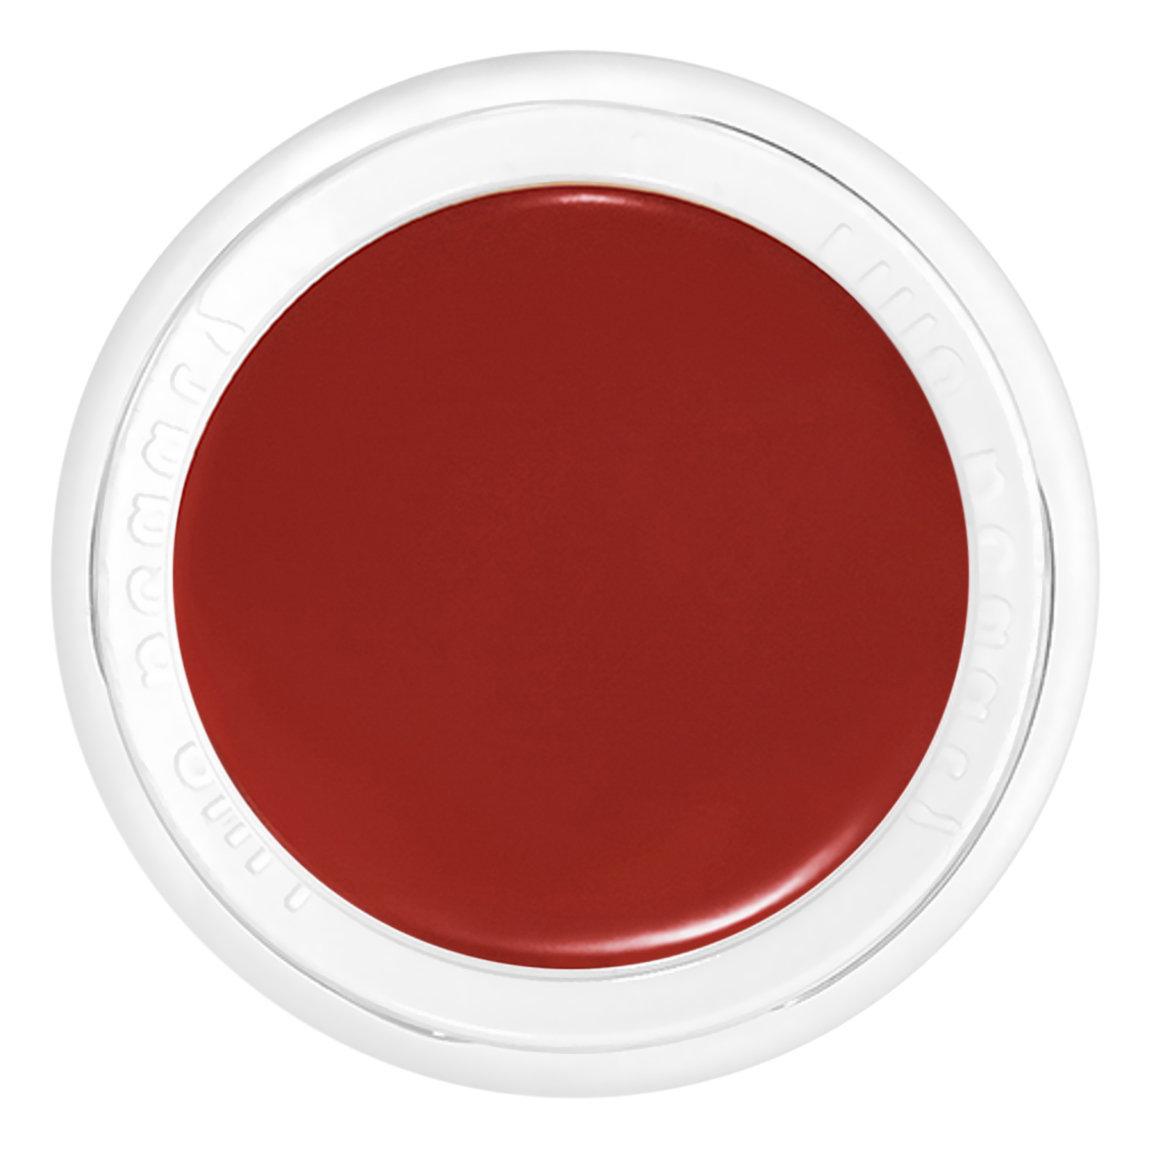 rms beauty Lip Shine Content alternative view 1.